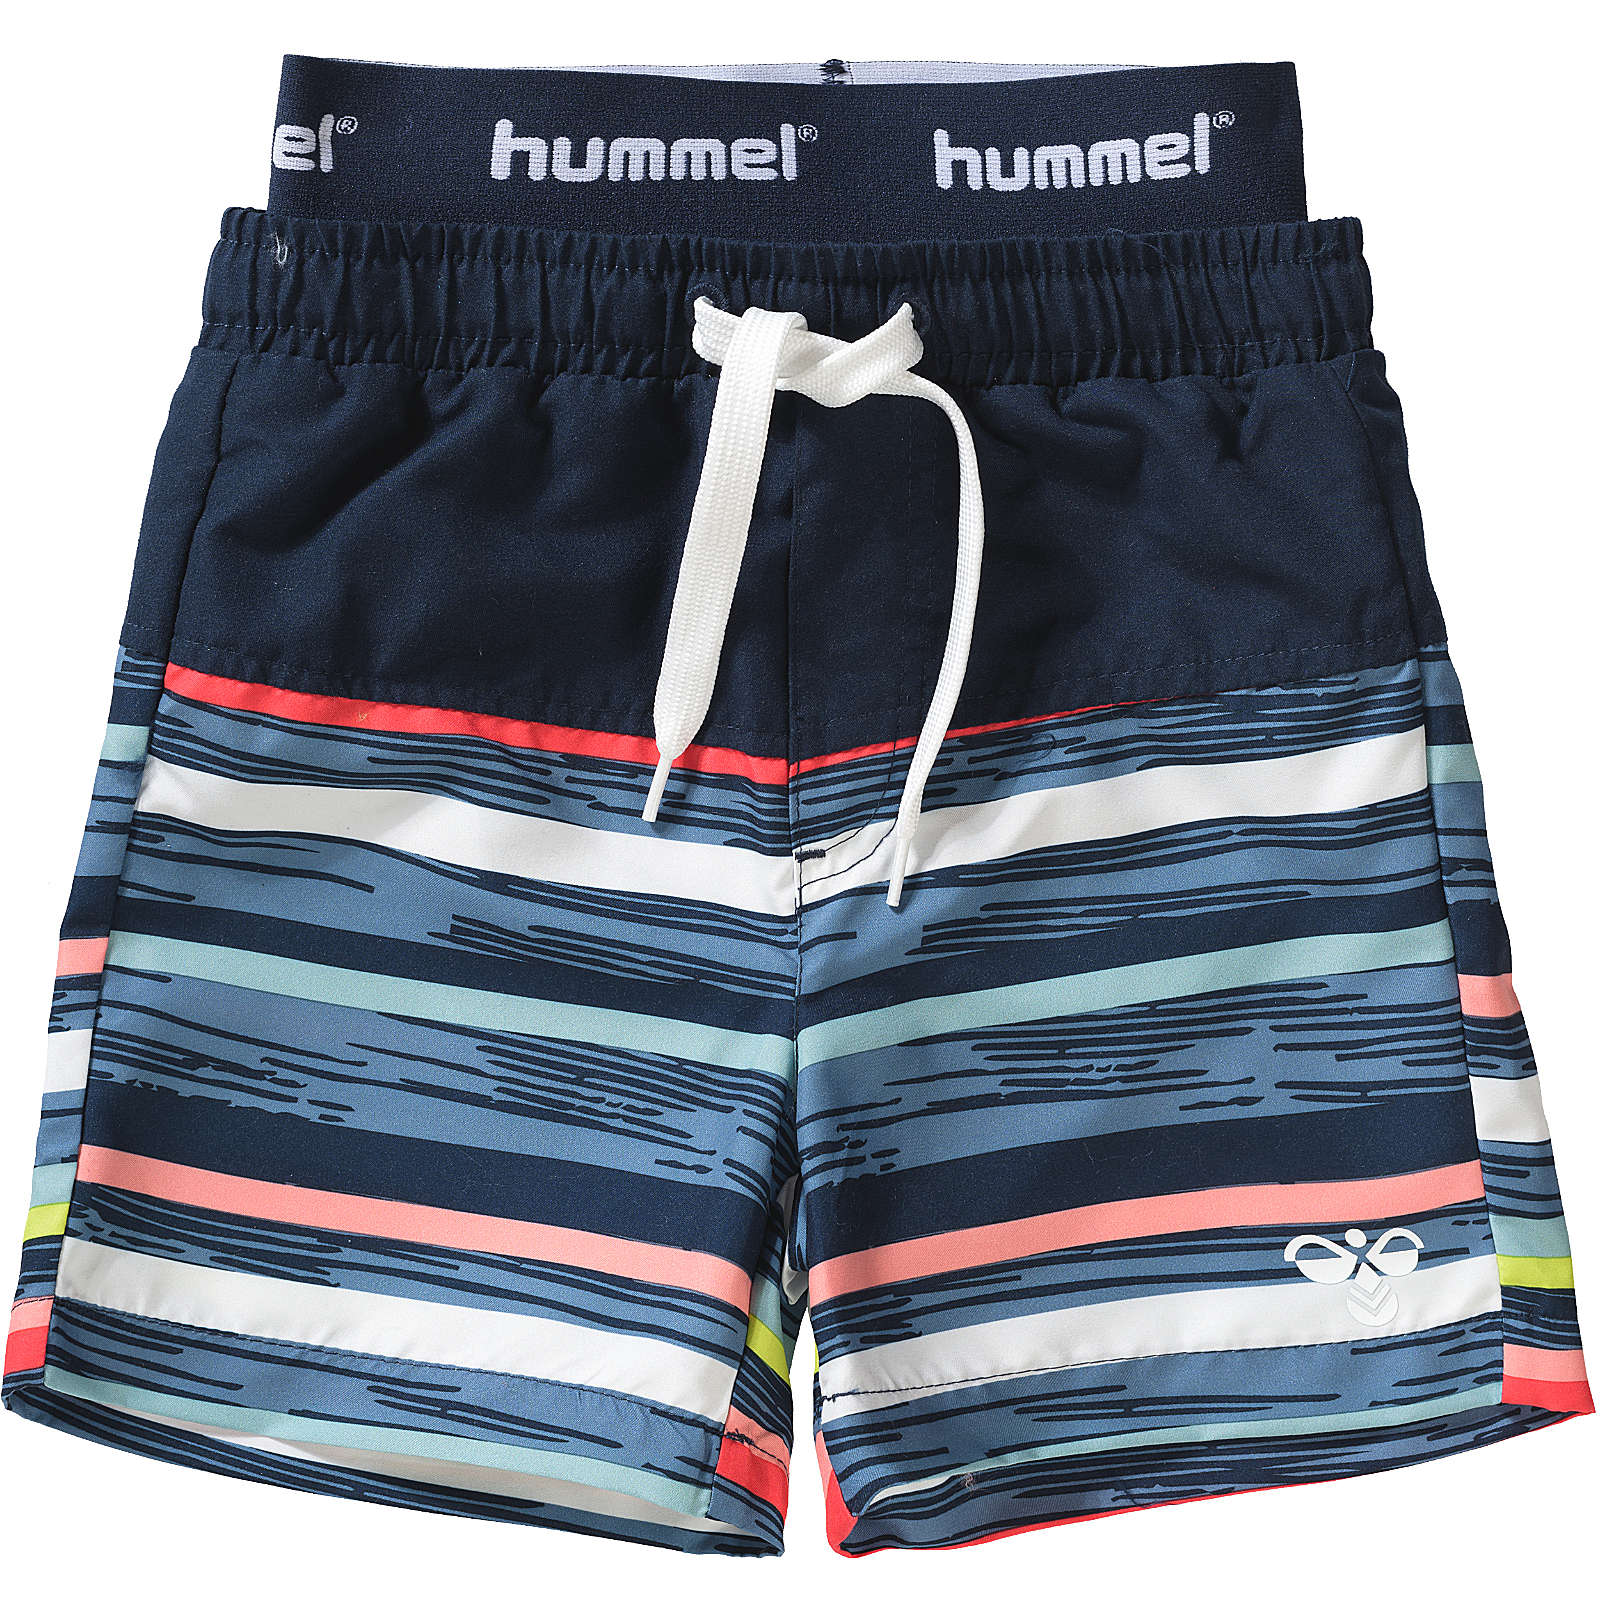 hummel Badeshorts SPOT für Jungen mehrfarbig Ju...